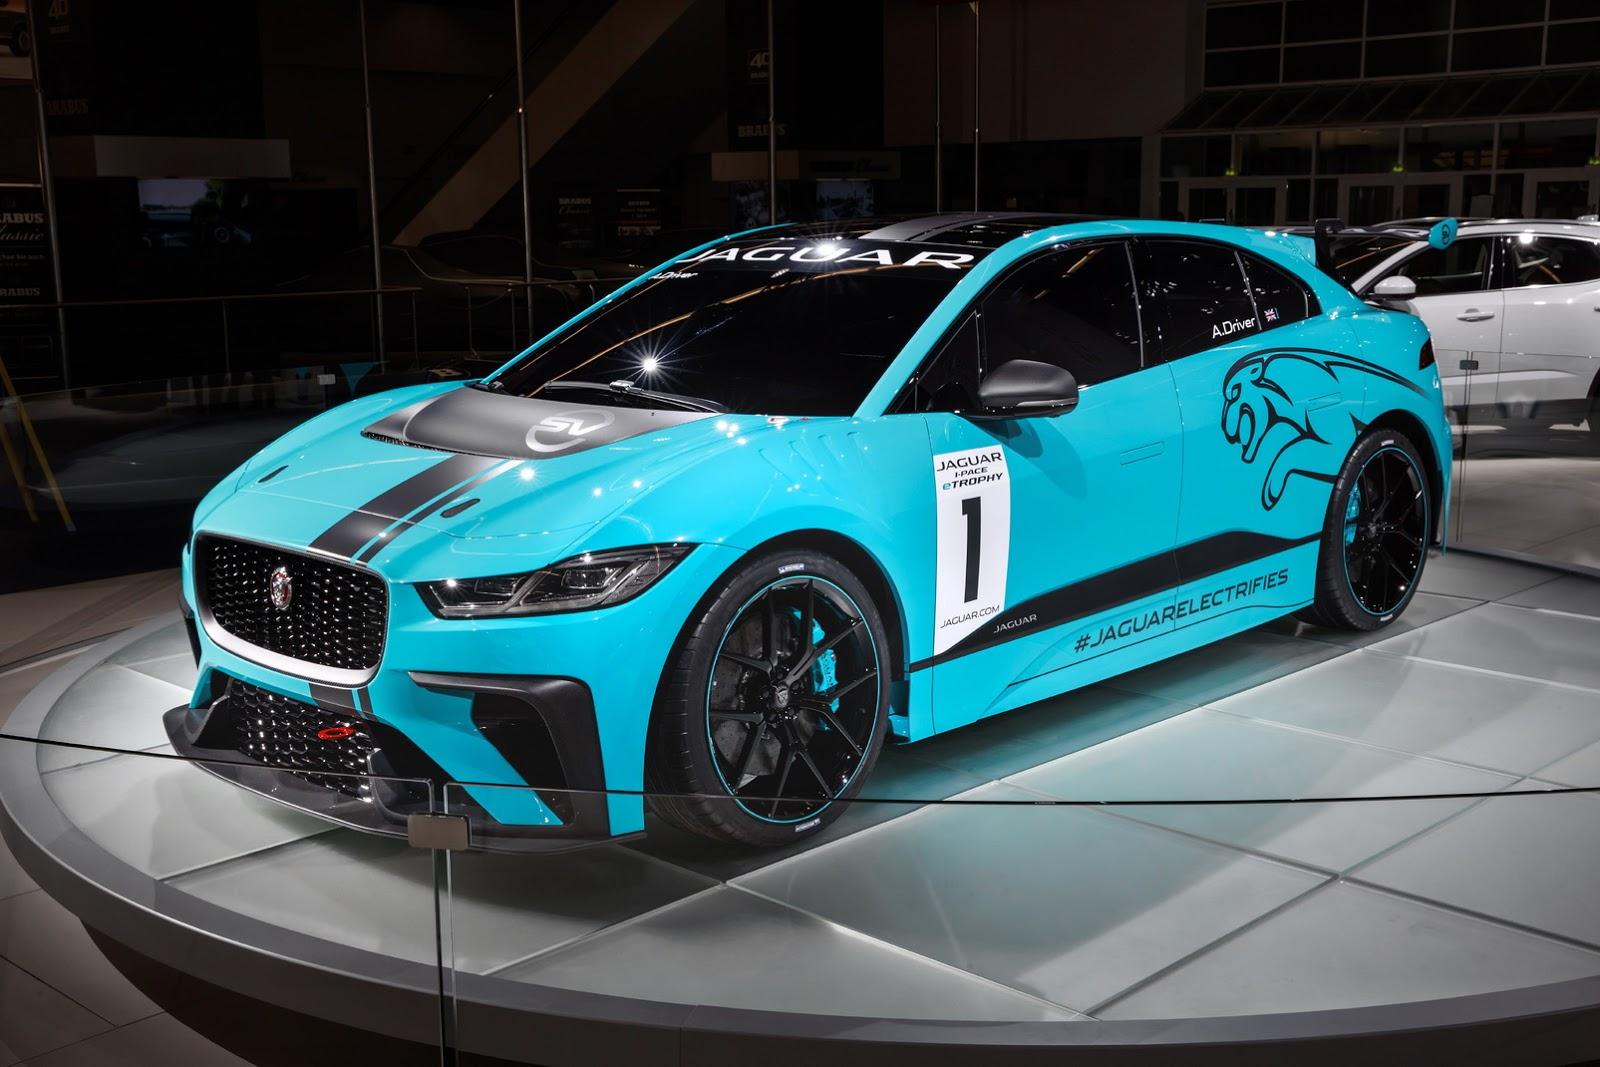 jaguar-ipace-race-car-iaa-8